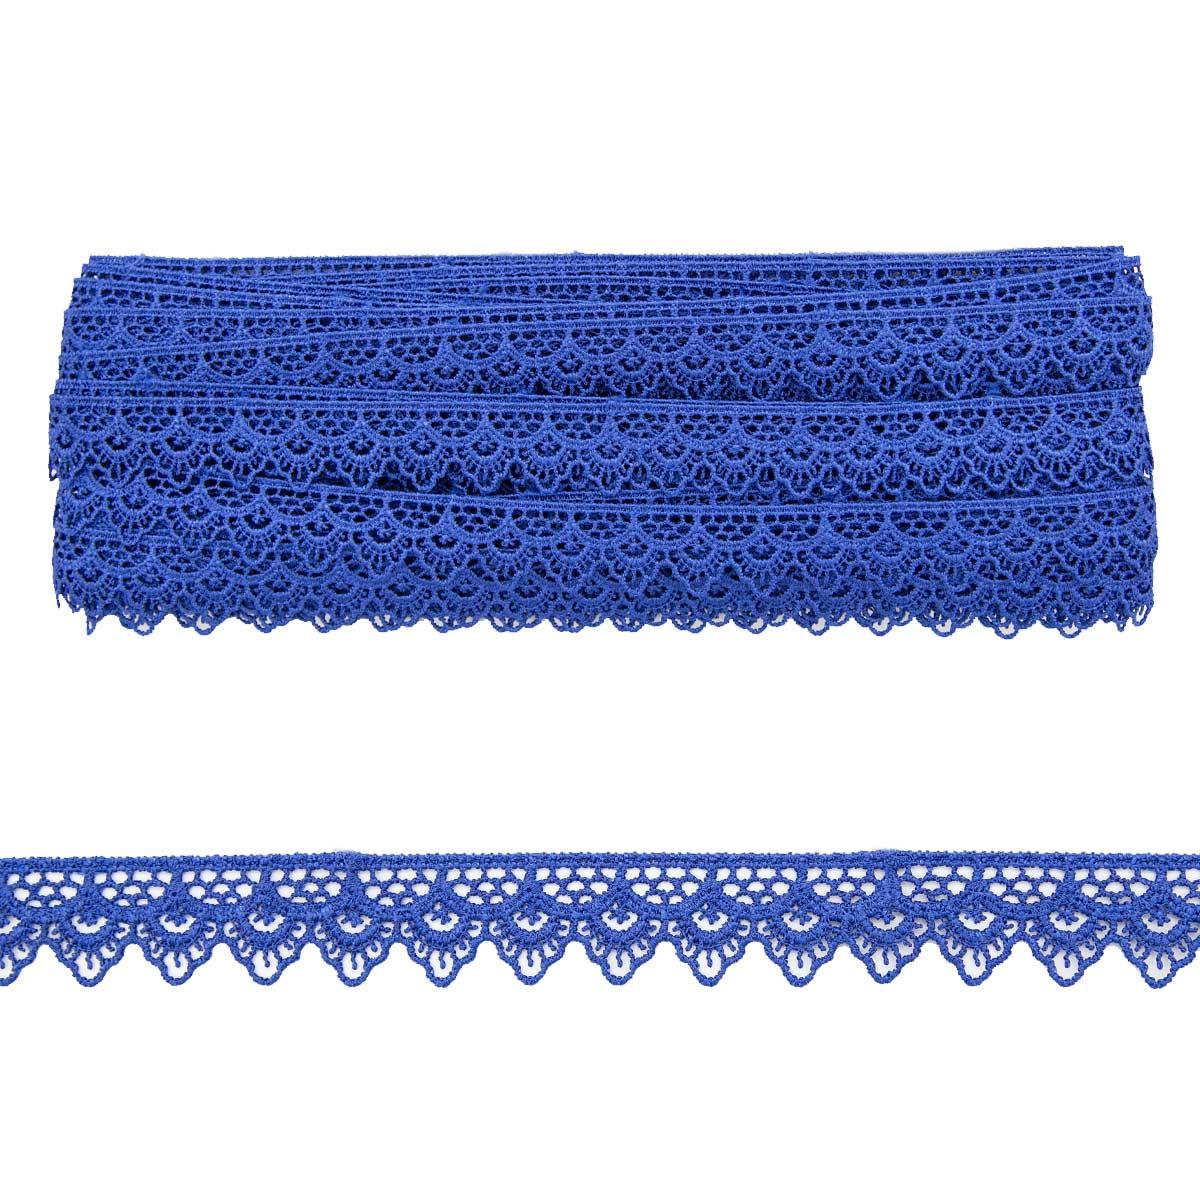 0575-1059 Кружево вязаное, 2 см*13,71 м